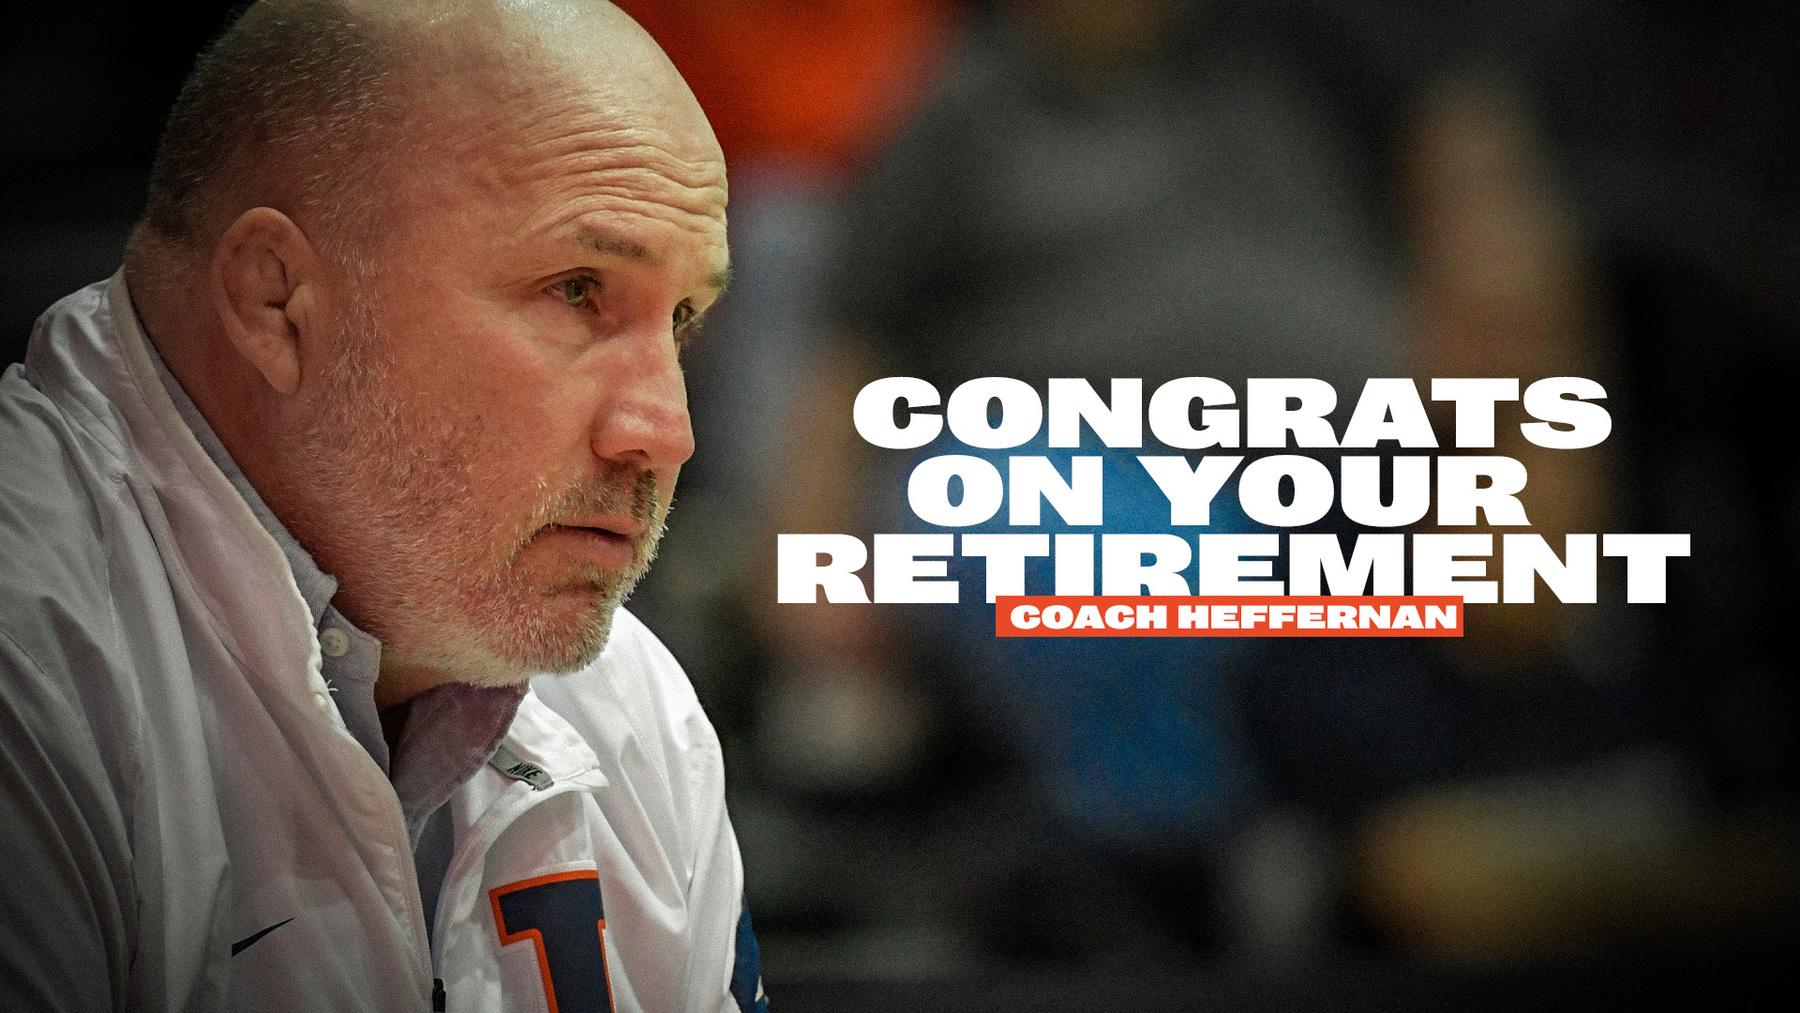 Illini Wrestling Coach Jim Heffernan with text, 'congratulations on your retirement'